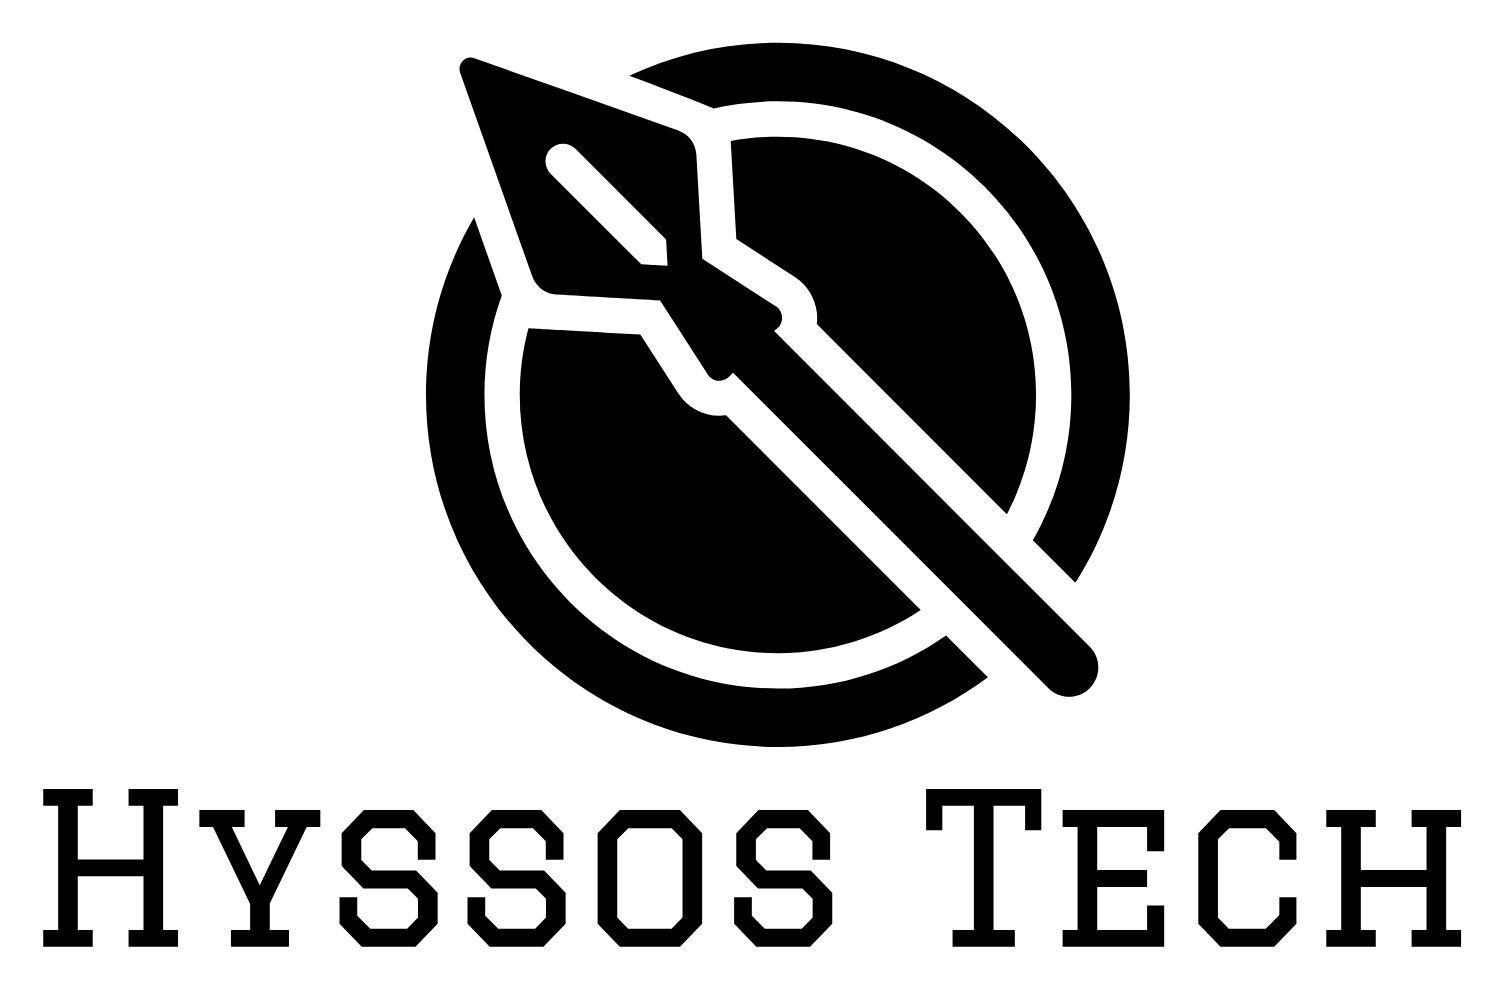 Hyssos